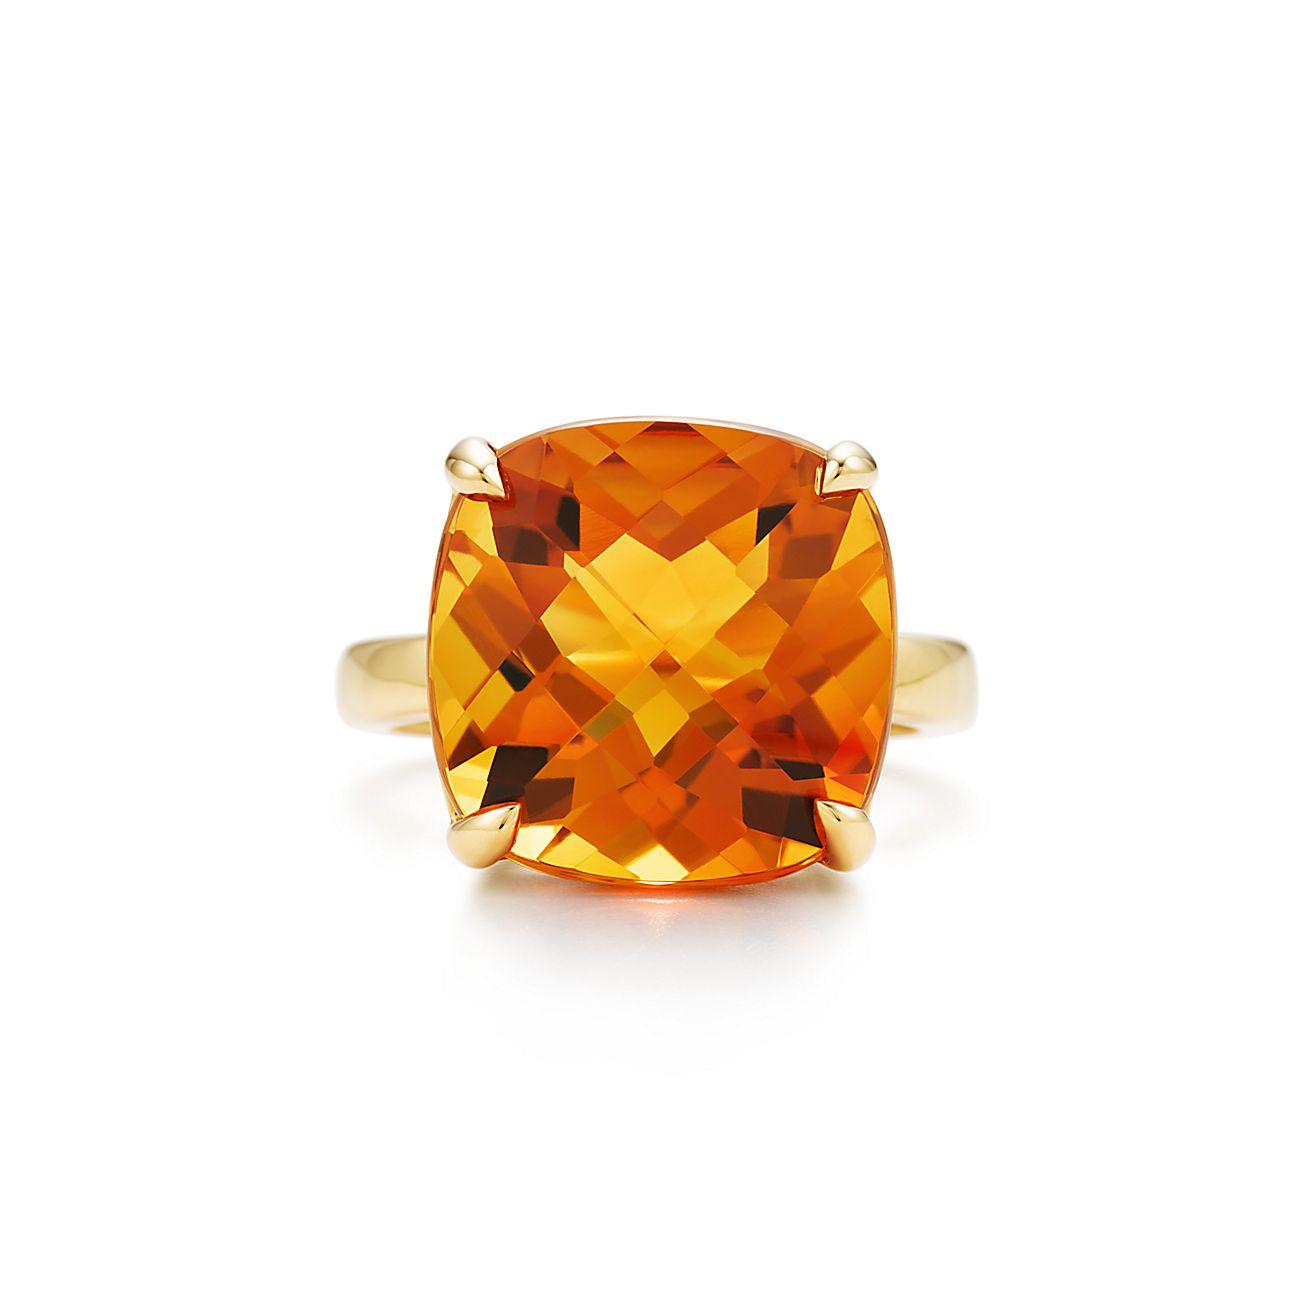 Tiffany Sparklers:Citrine Cocktail Ring